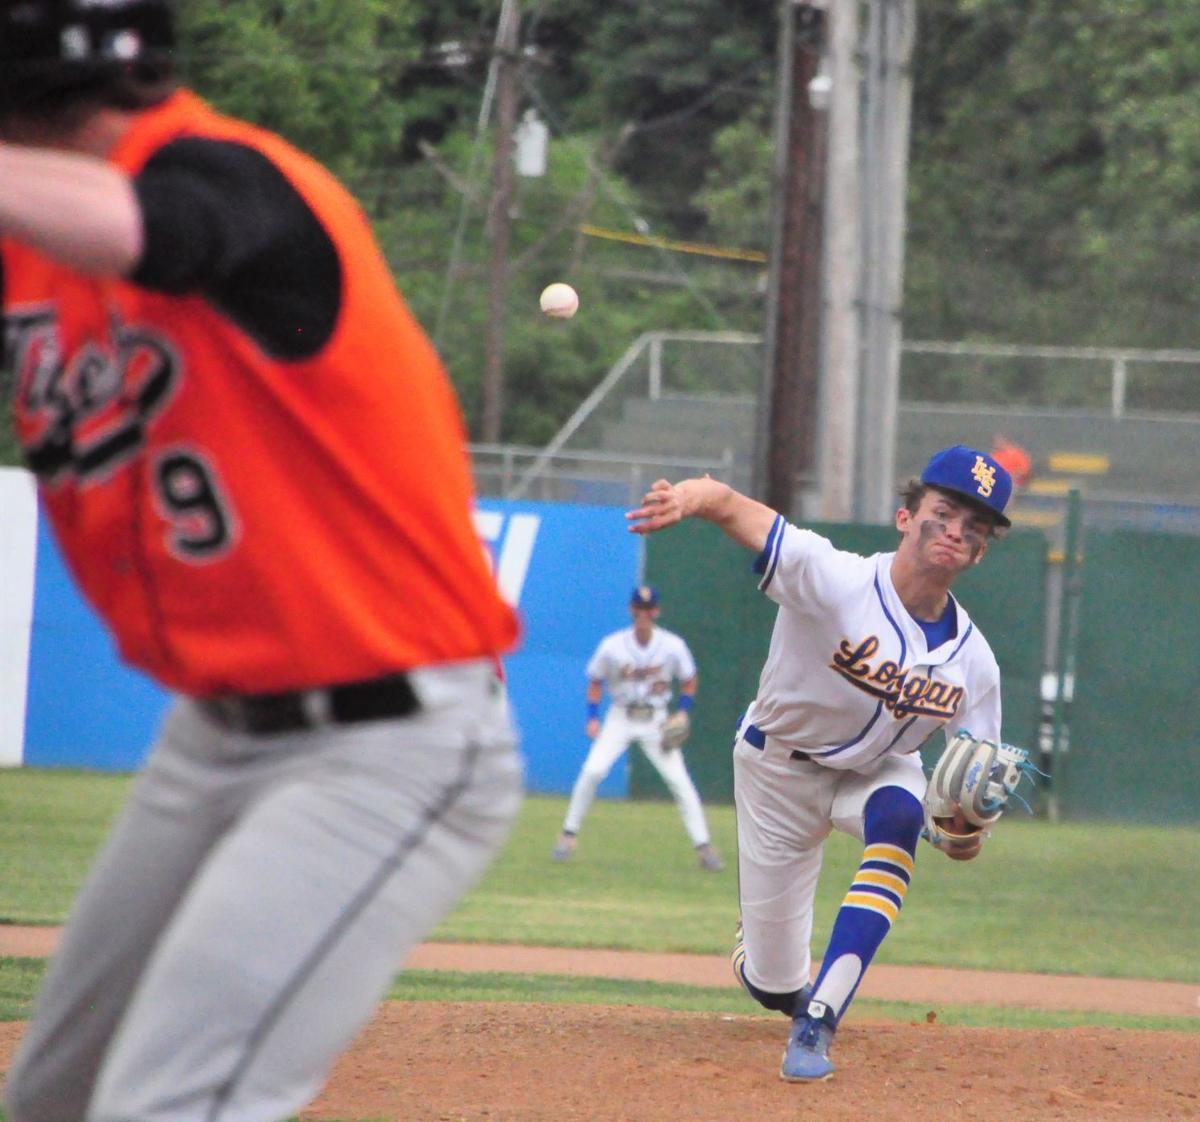 0210609-log-logan sectional baseball finals Jarron Glick pitching BEST